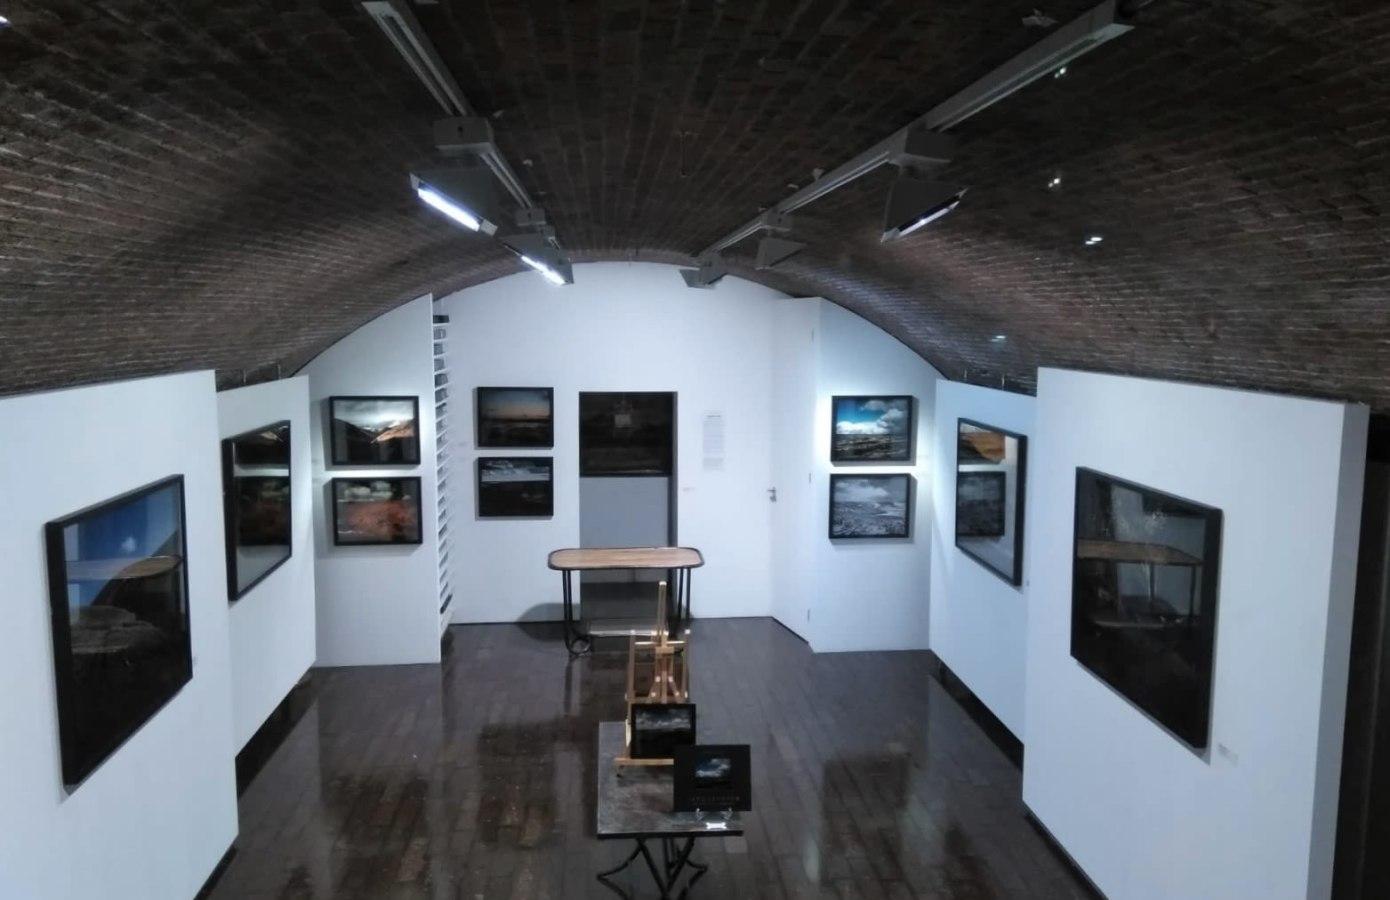 Saddleworth: Responding to a Landscape, Matthew Murray,